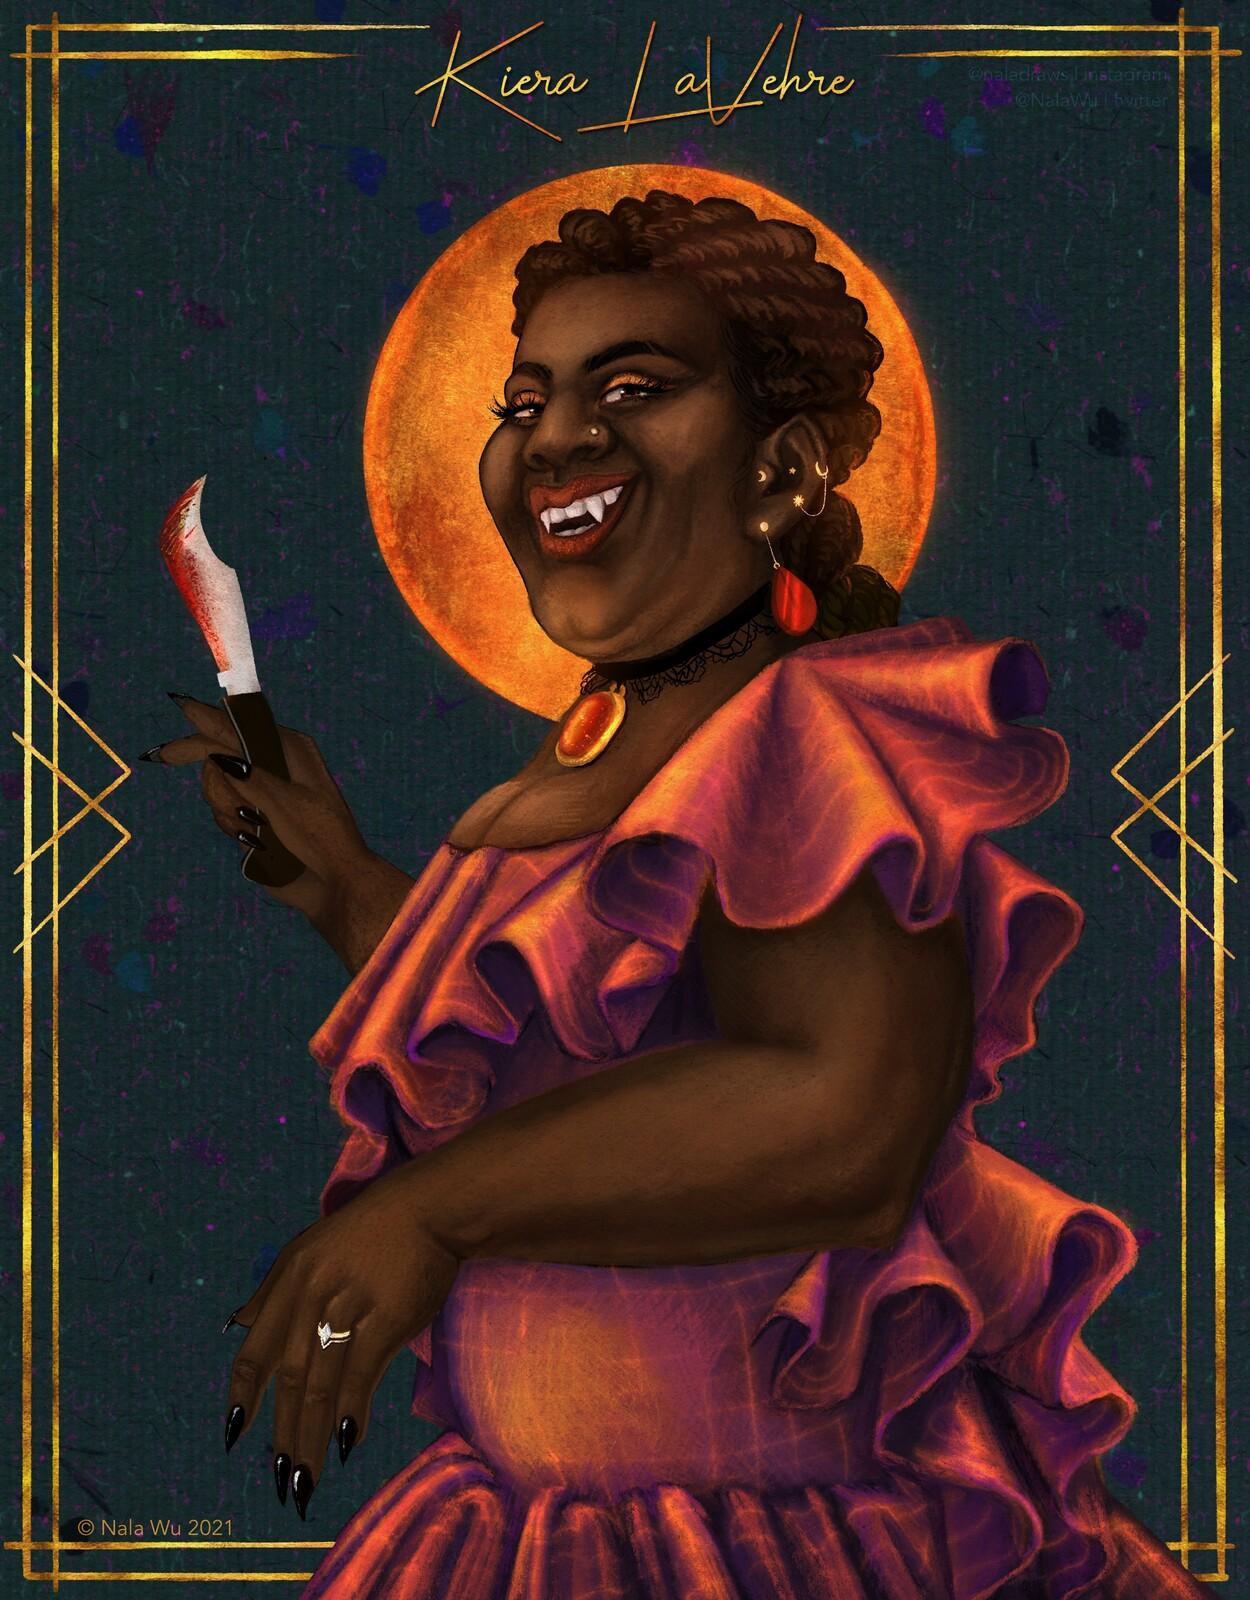 Character Illustration — Kiera LaVehre